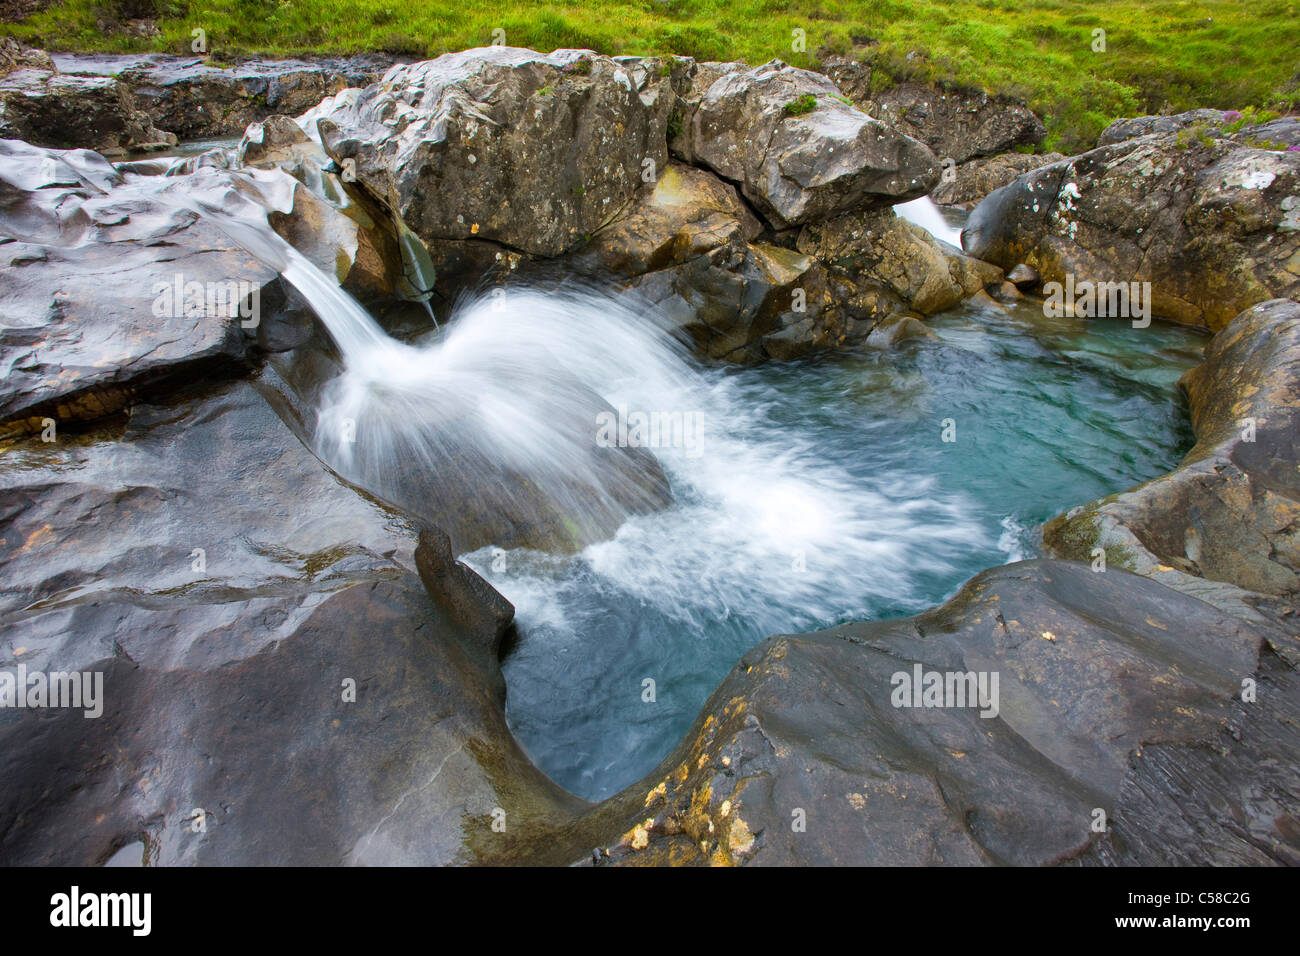 Fairy pools, Great Britain, Scotland, Europe, island, isle, Skye, brook, rock, cliff, erosion, waterfall - Stock Image